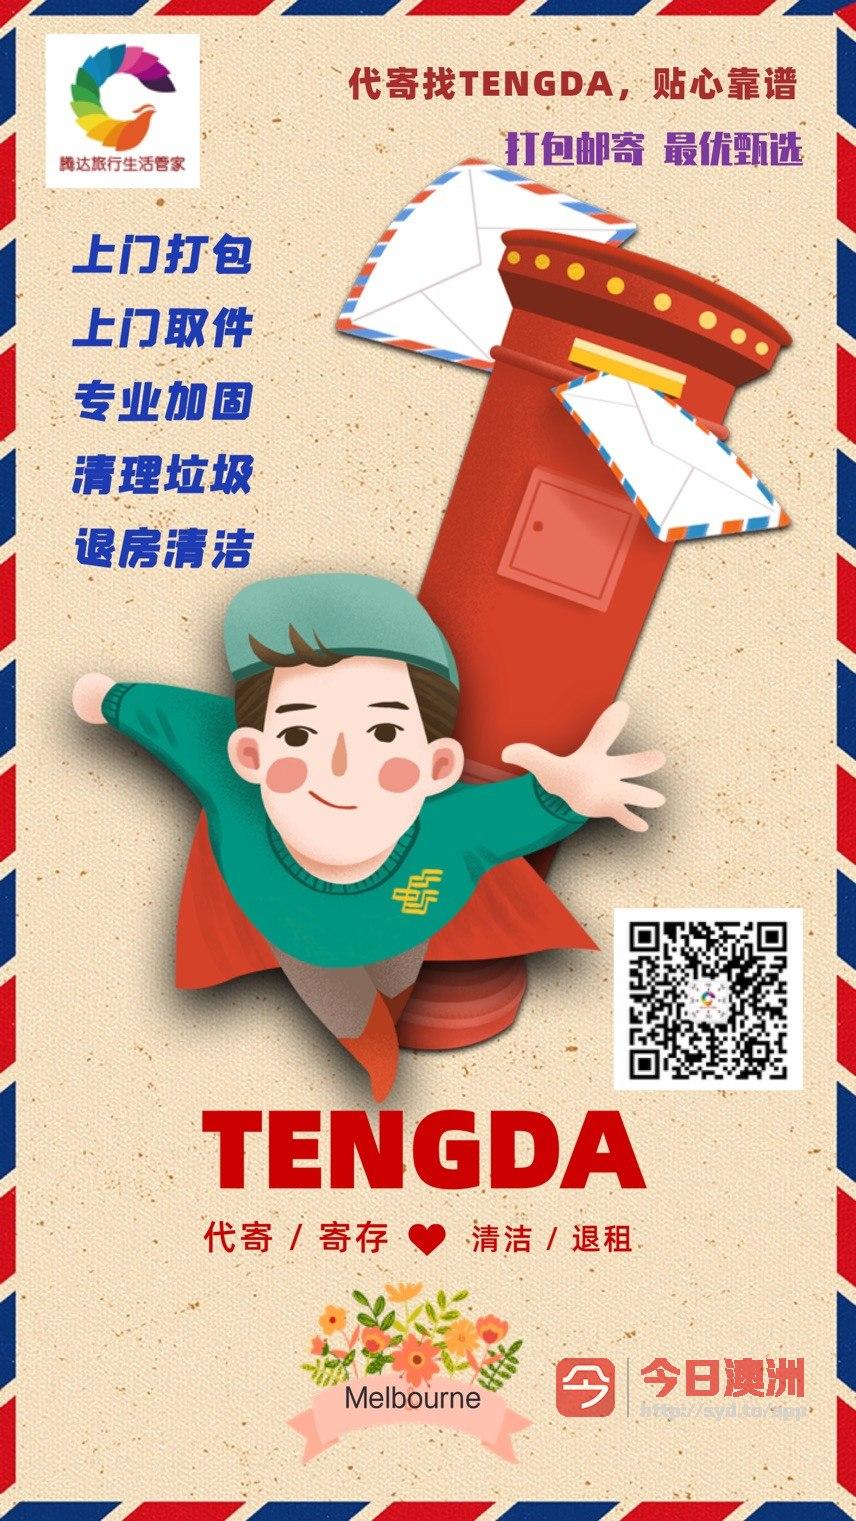 TENGDA  行李邮局回国特价优惠仅11每公斤